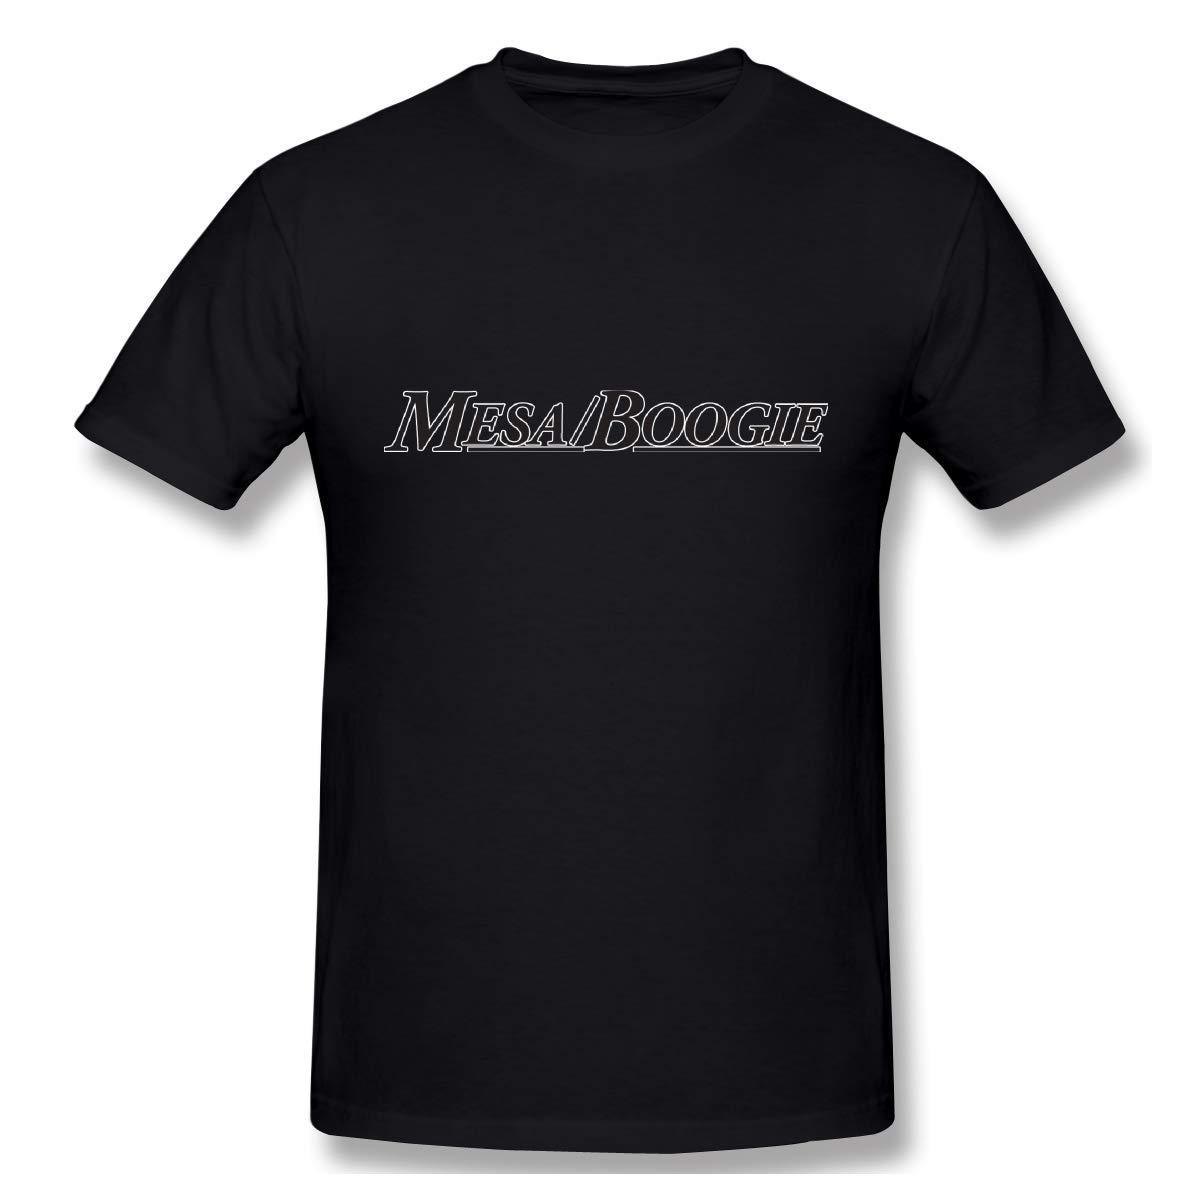 Willardscox S Mesa Boogie Casual Comfortable Top Shirts